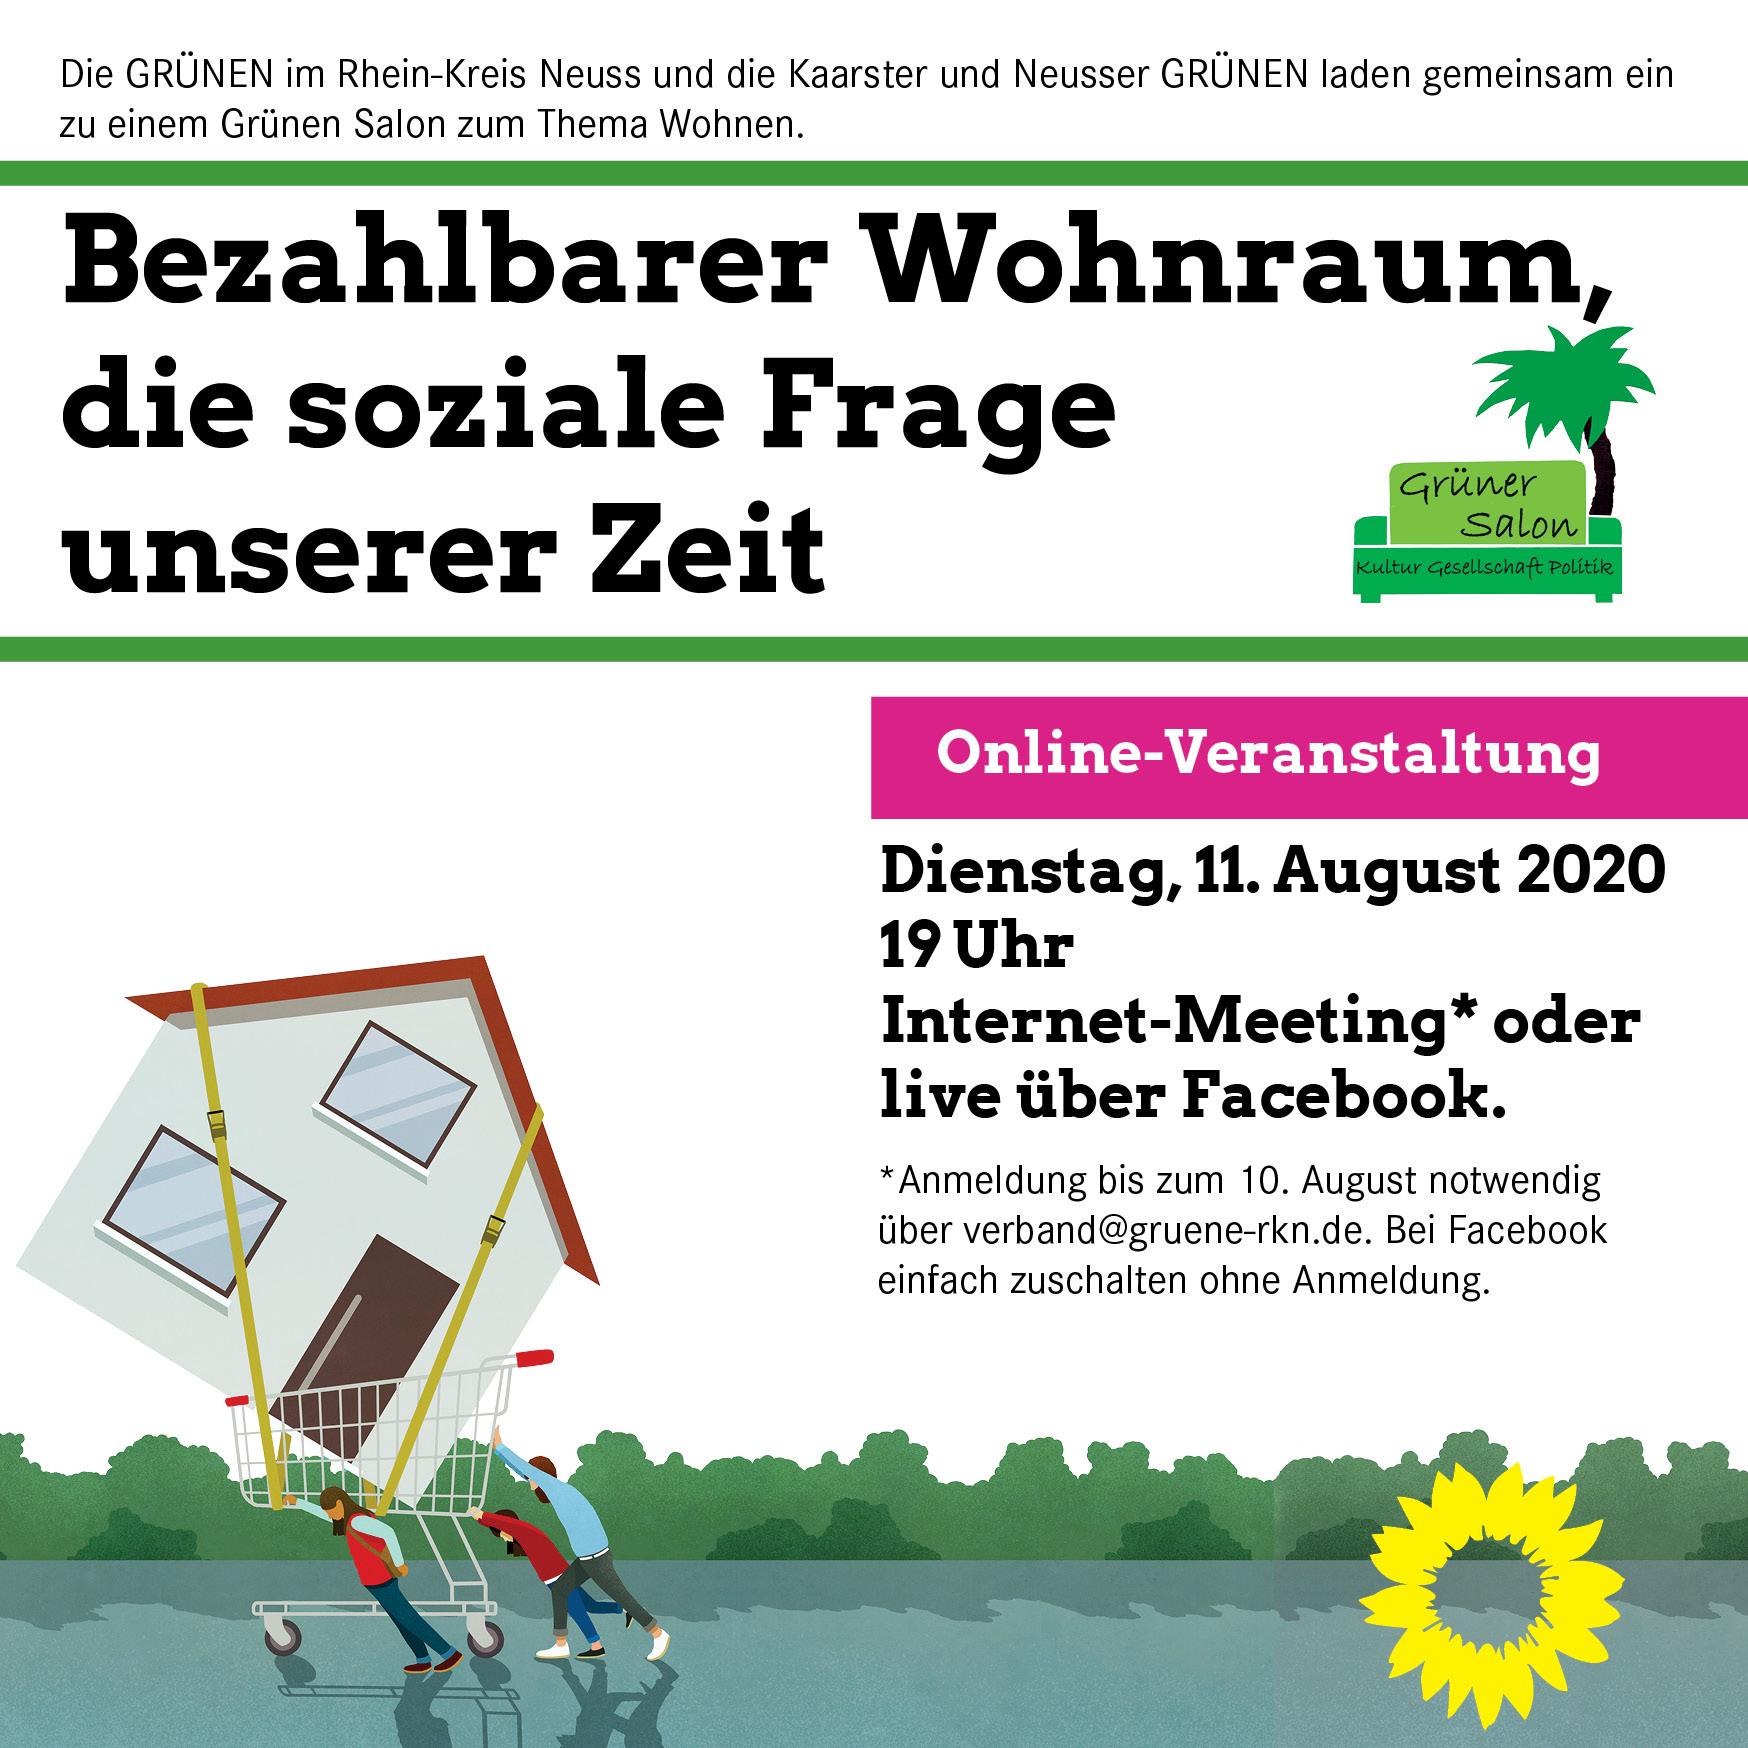 GRÜNER SALON online: Bezahlbarer Wohnraum